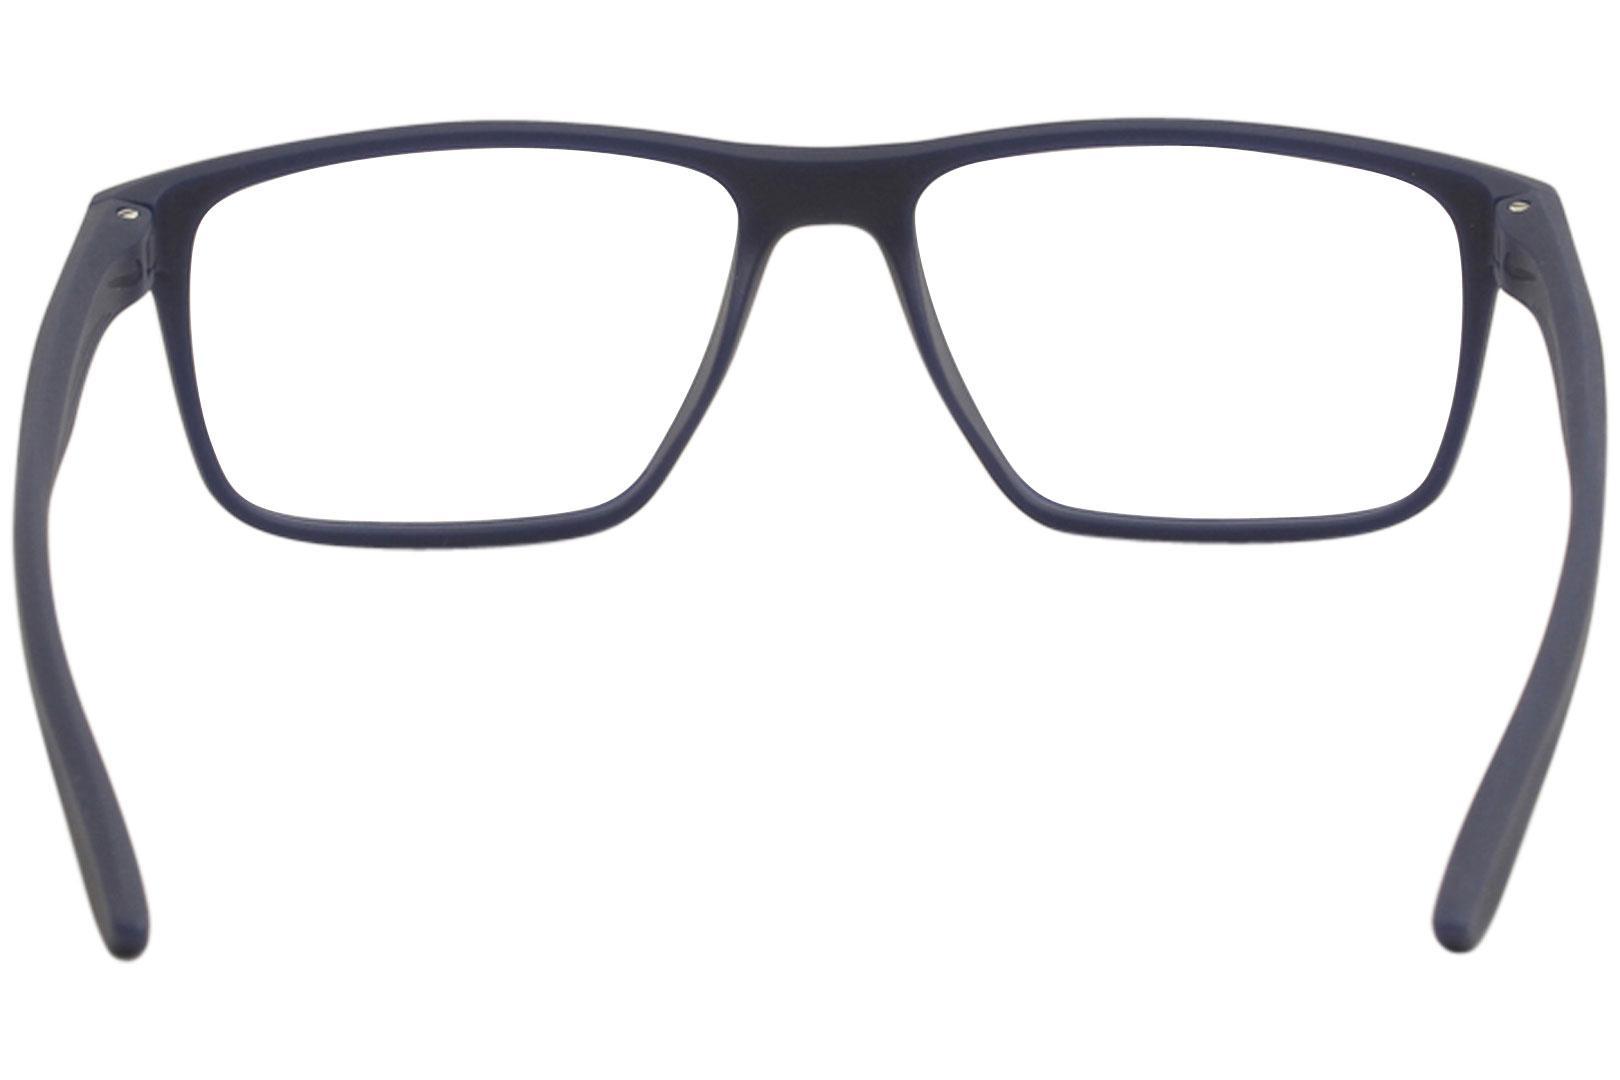 d5222a995a8 Nike Youth Boys Eyeglasses 5002 Full Rim Optical Frame